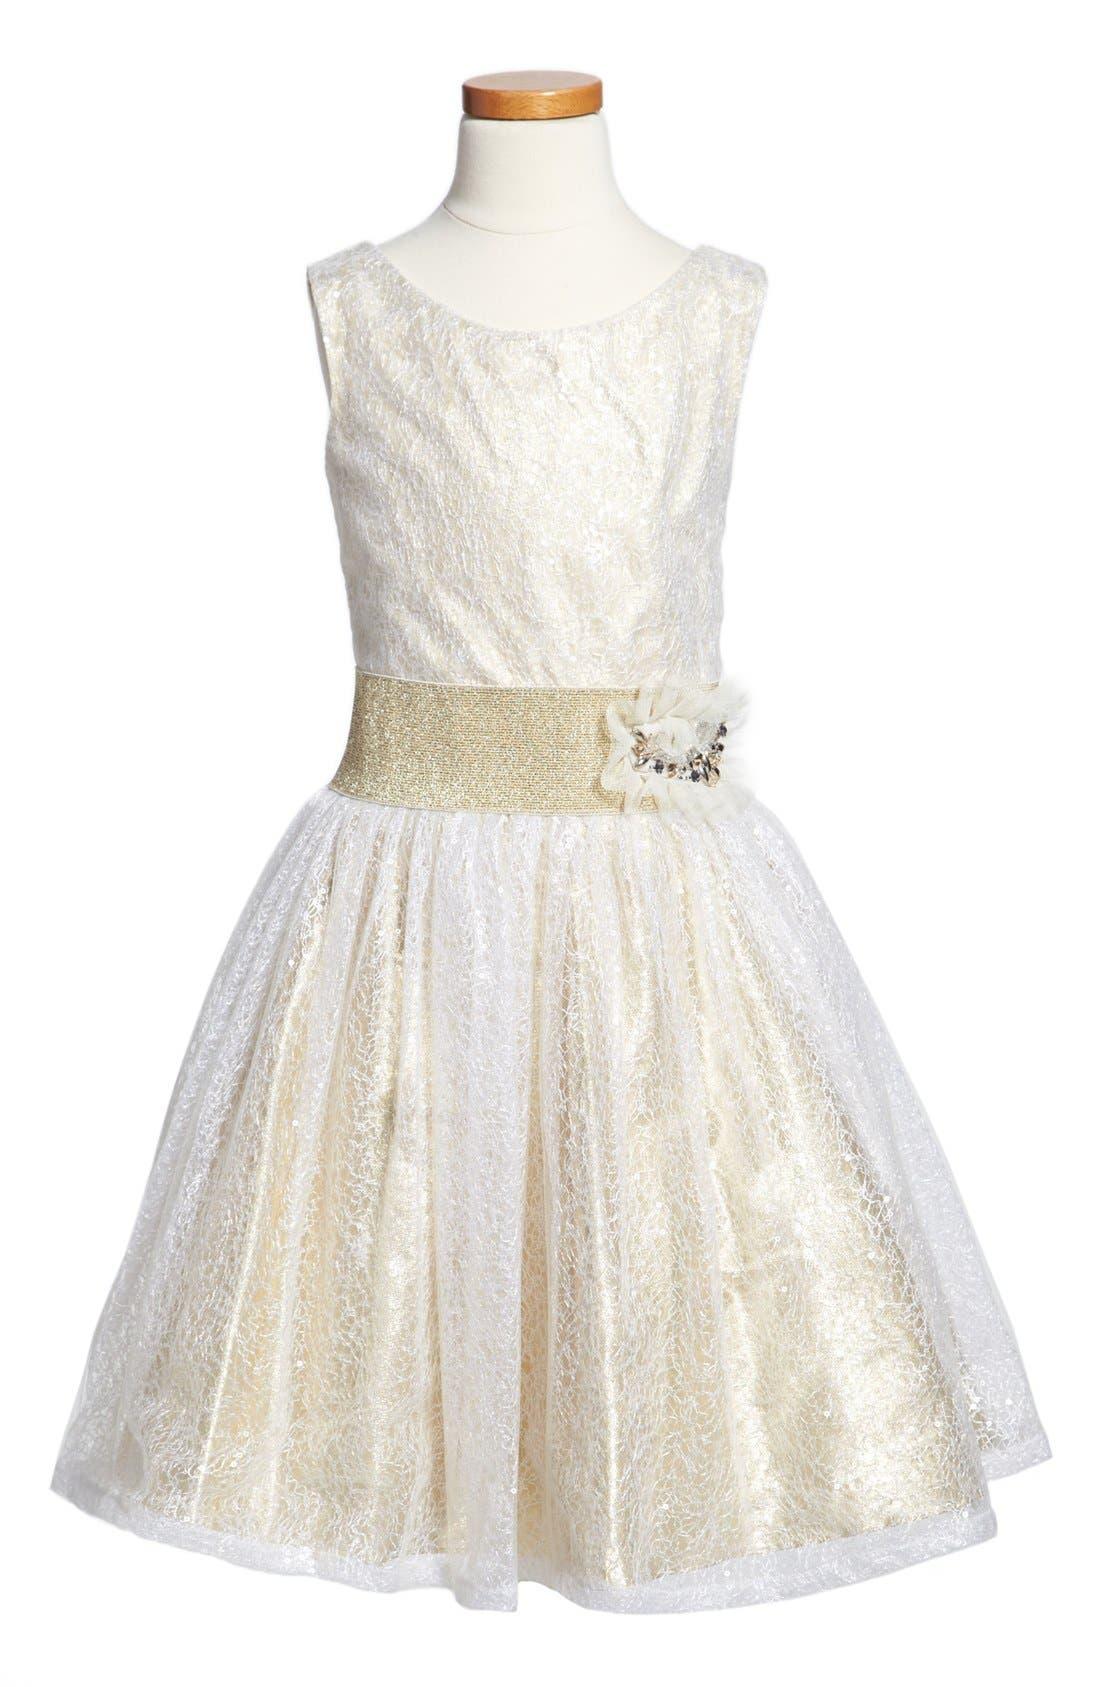 Alternate Image 1 Selected - Zoe Ltd Sleeveless Dress (Big Girls)